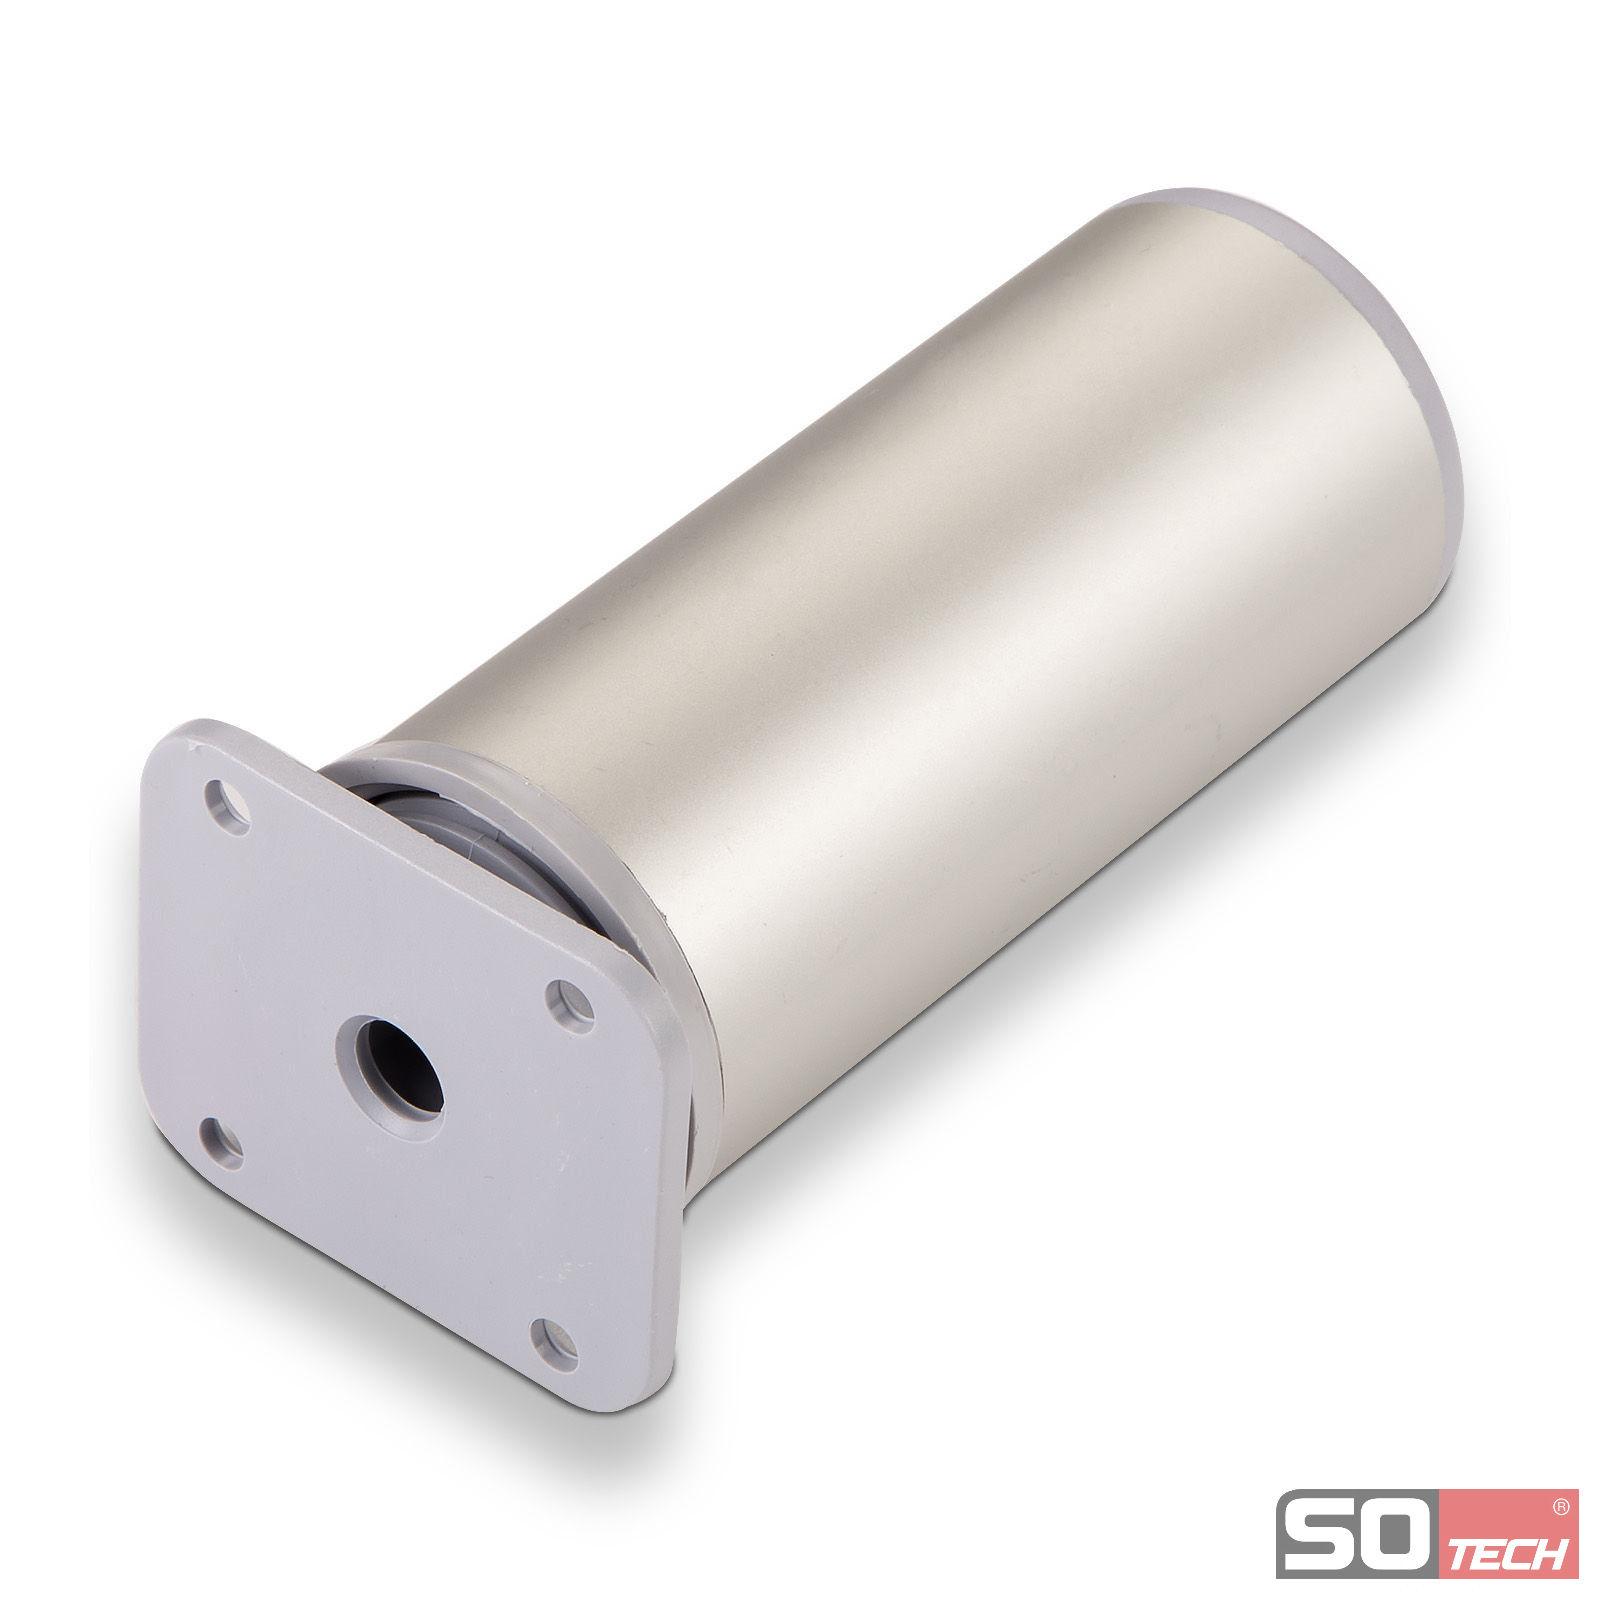 Moebelfuss-Moebelfuesse-40-mm-Sockelfuss-Sockelfuesse-Schrankfuss-Schrankfuesse-Fuss-Fuesse